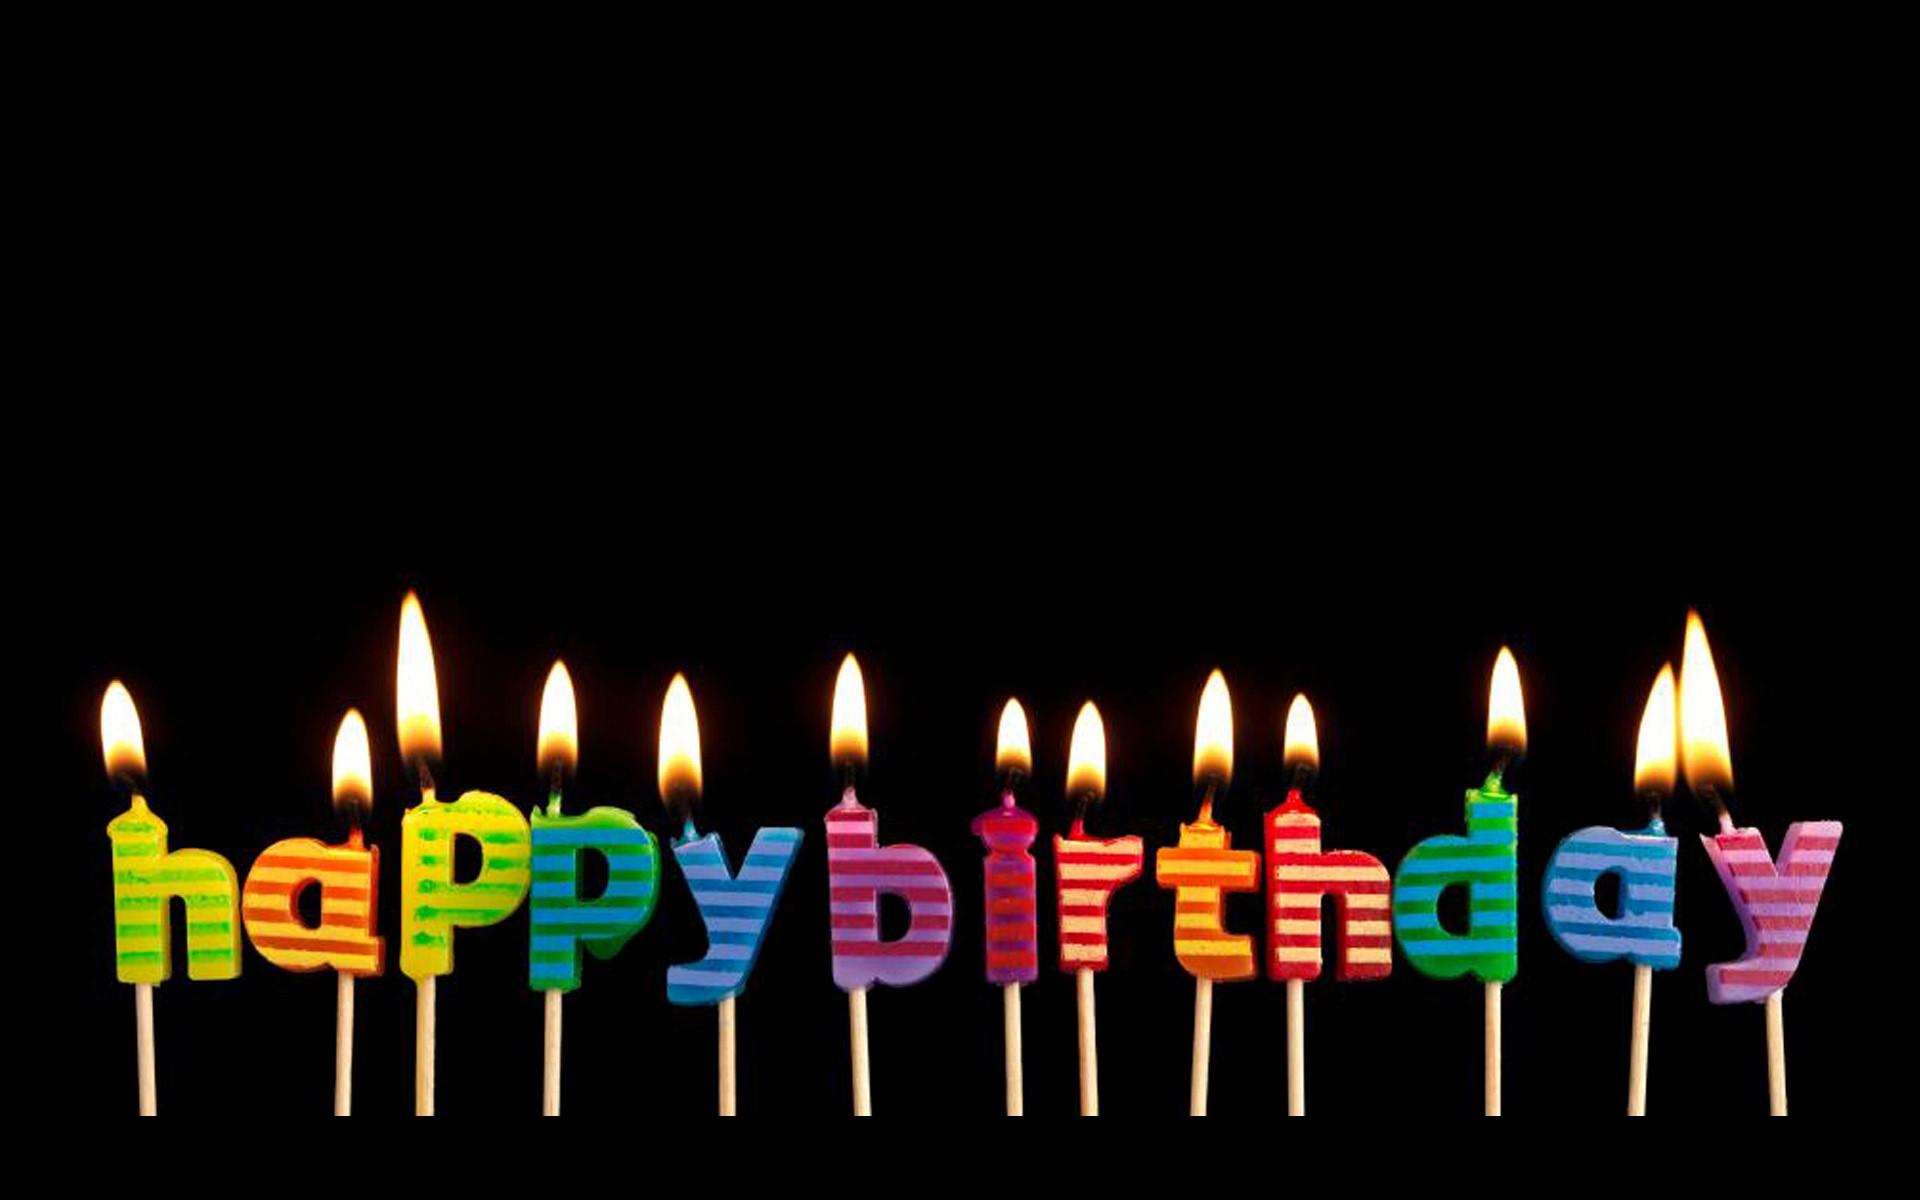 Happy Birthday Images Pixelstalk Net